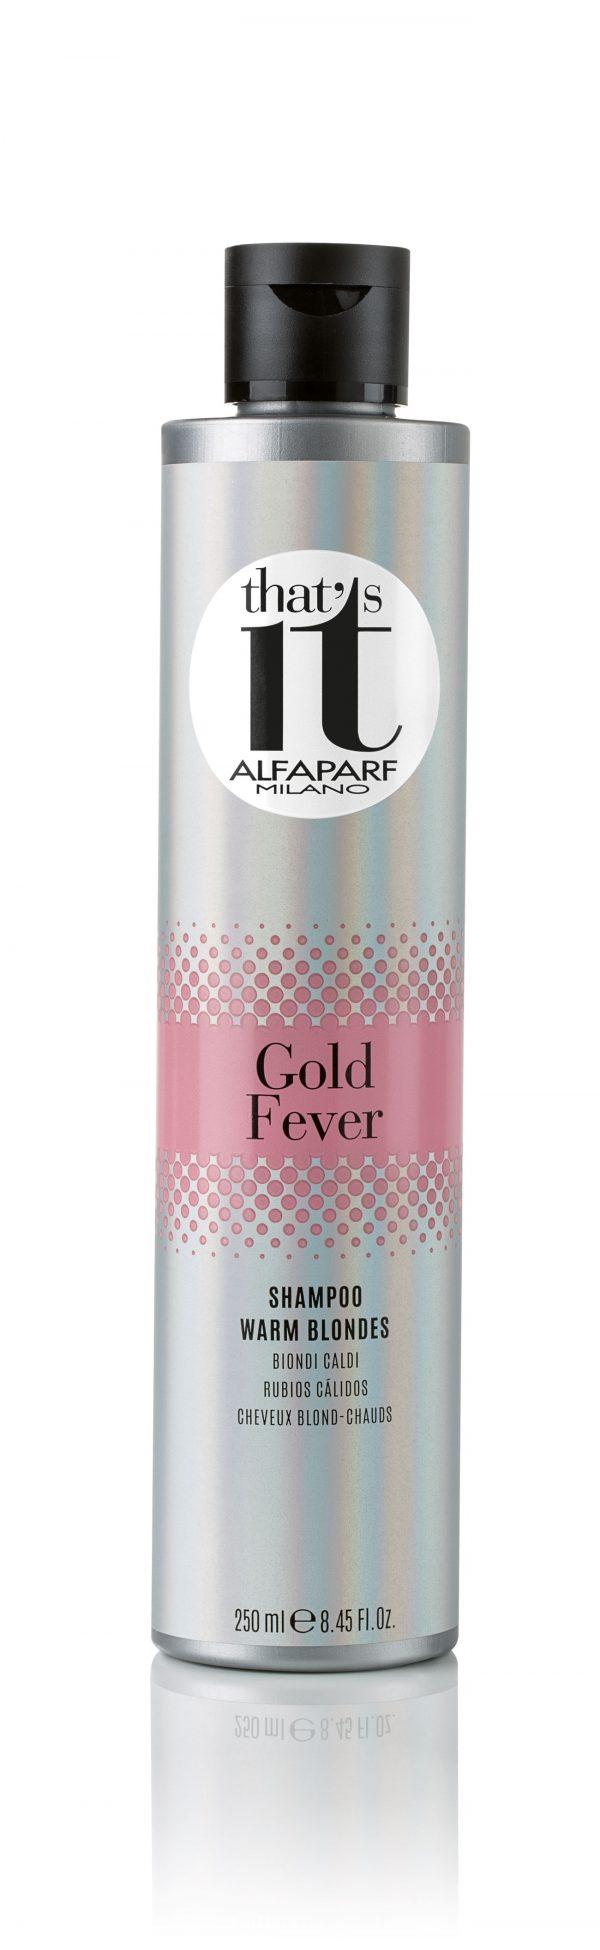 Thats It Alfaparf Milano Gold Fever Shampoo 250ml